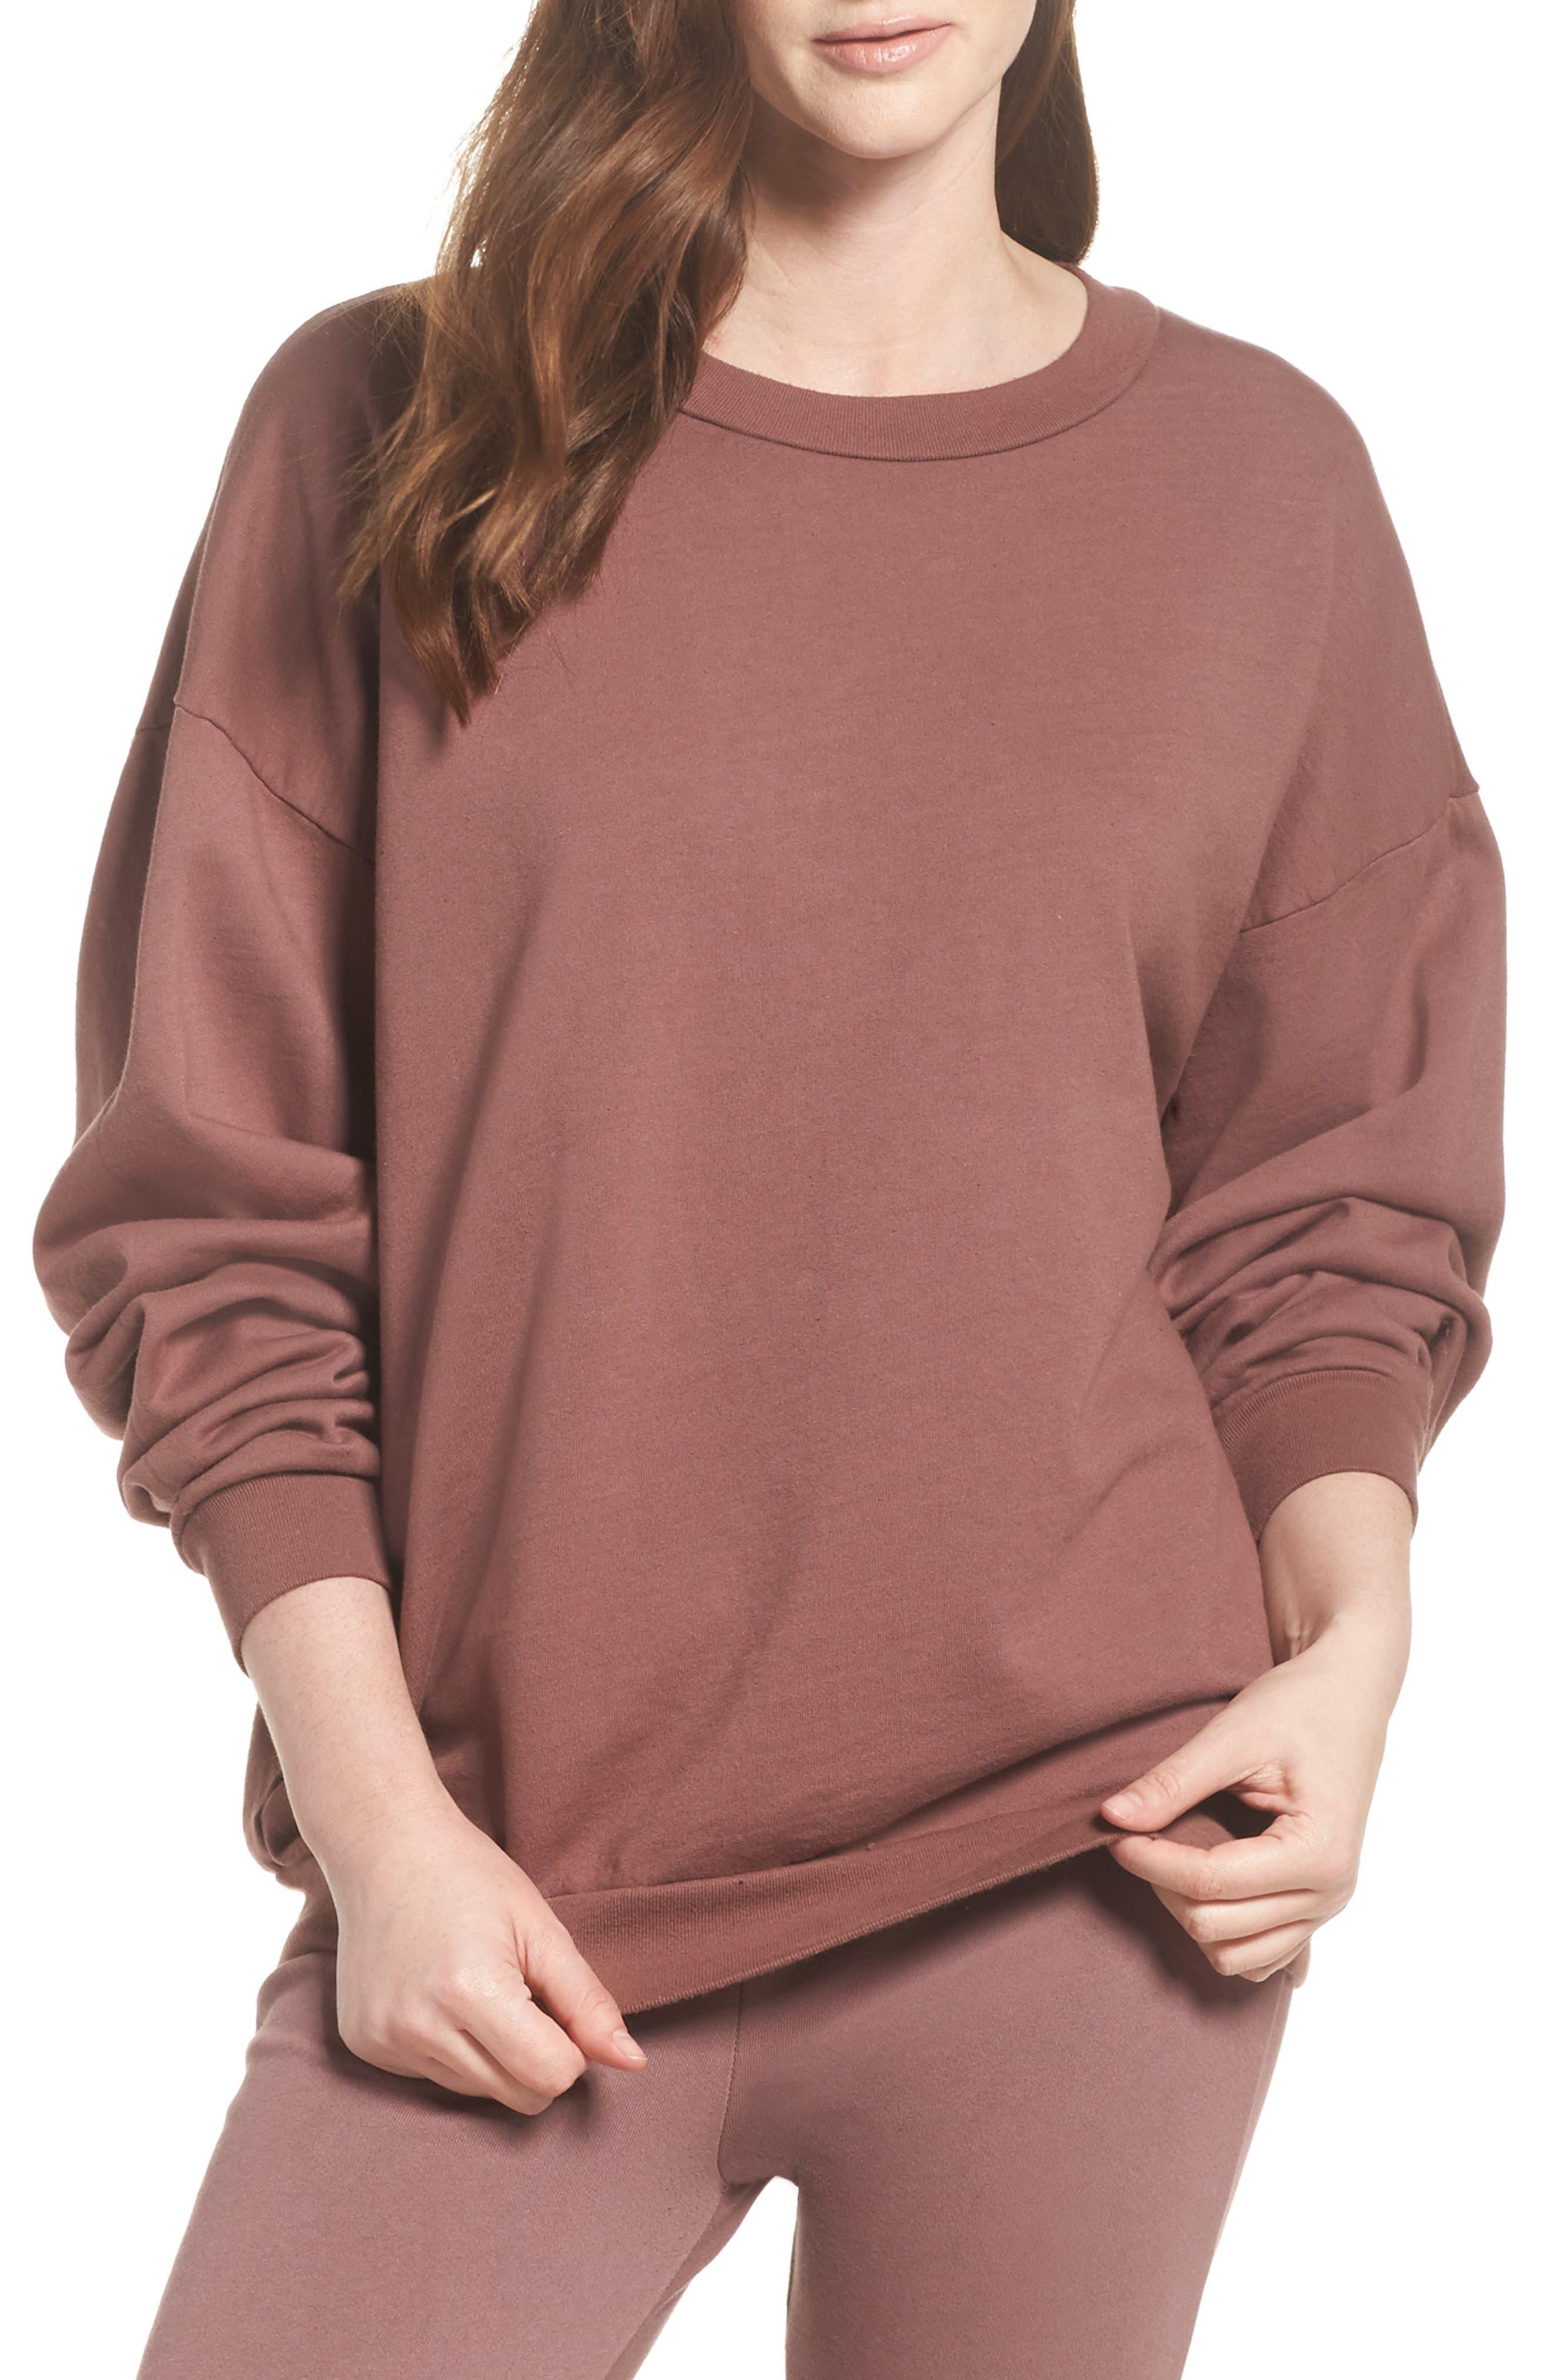 Ellstan Oversize Boyfriend Sweatshirt,                             Main thumbnail 2, color,